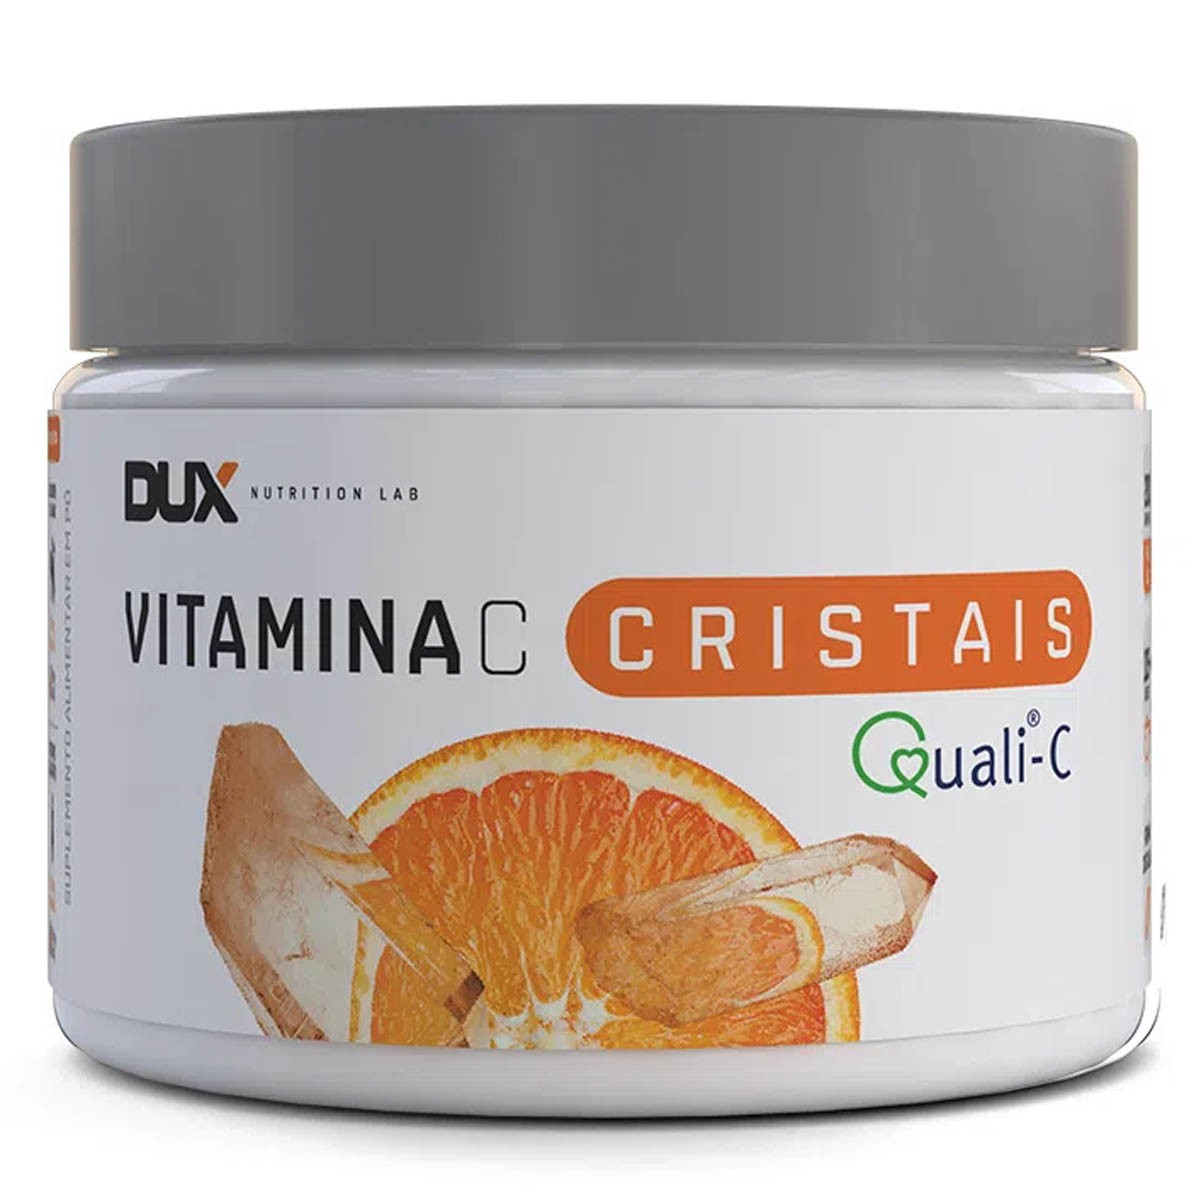 Vitamina C 200g - Dux Nutrition